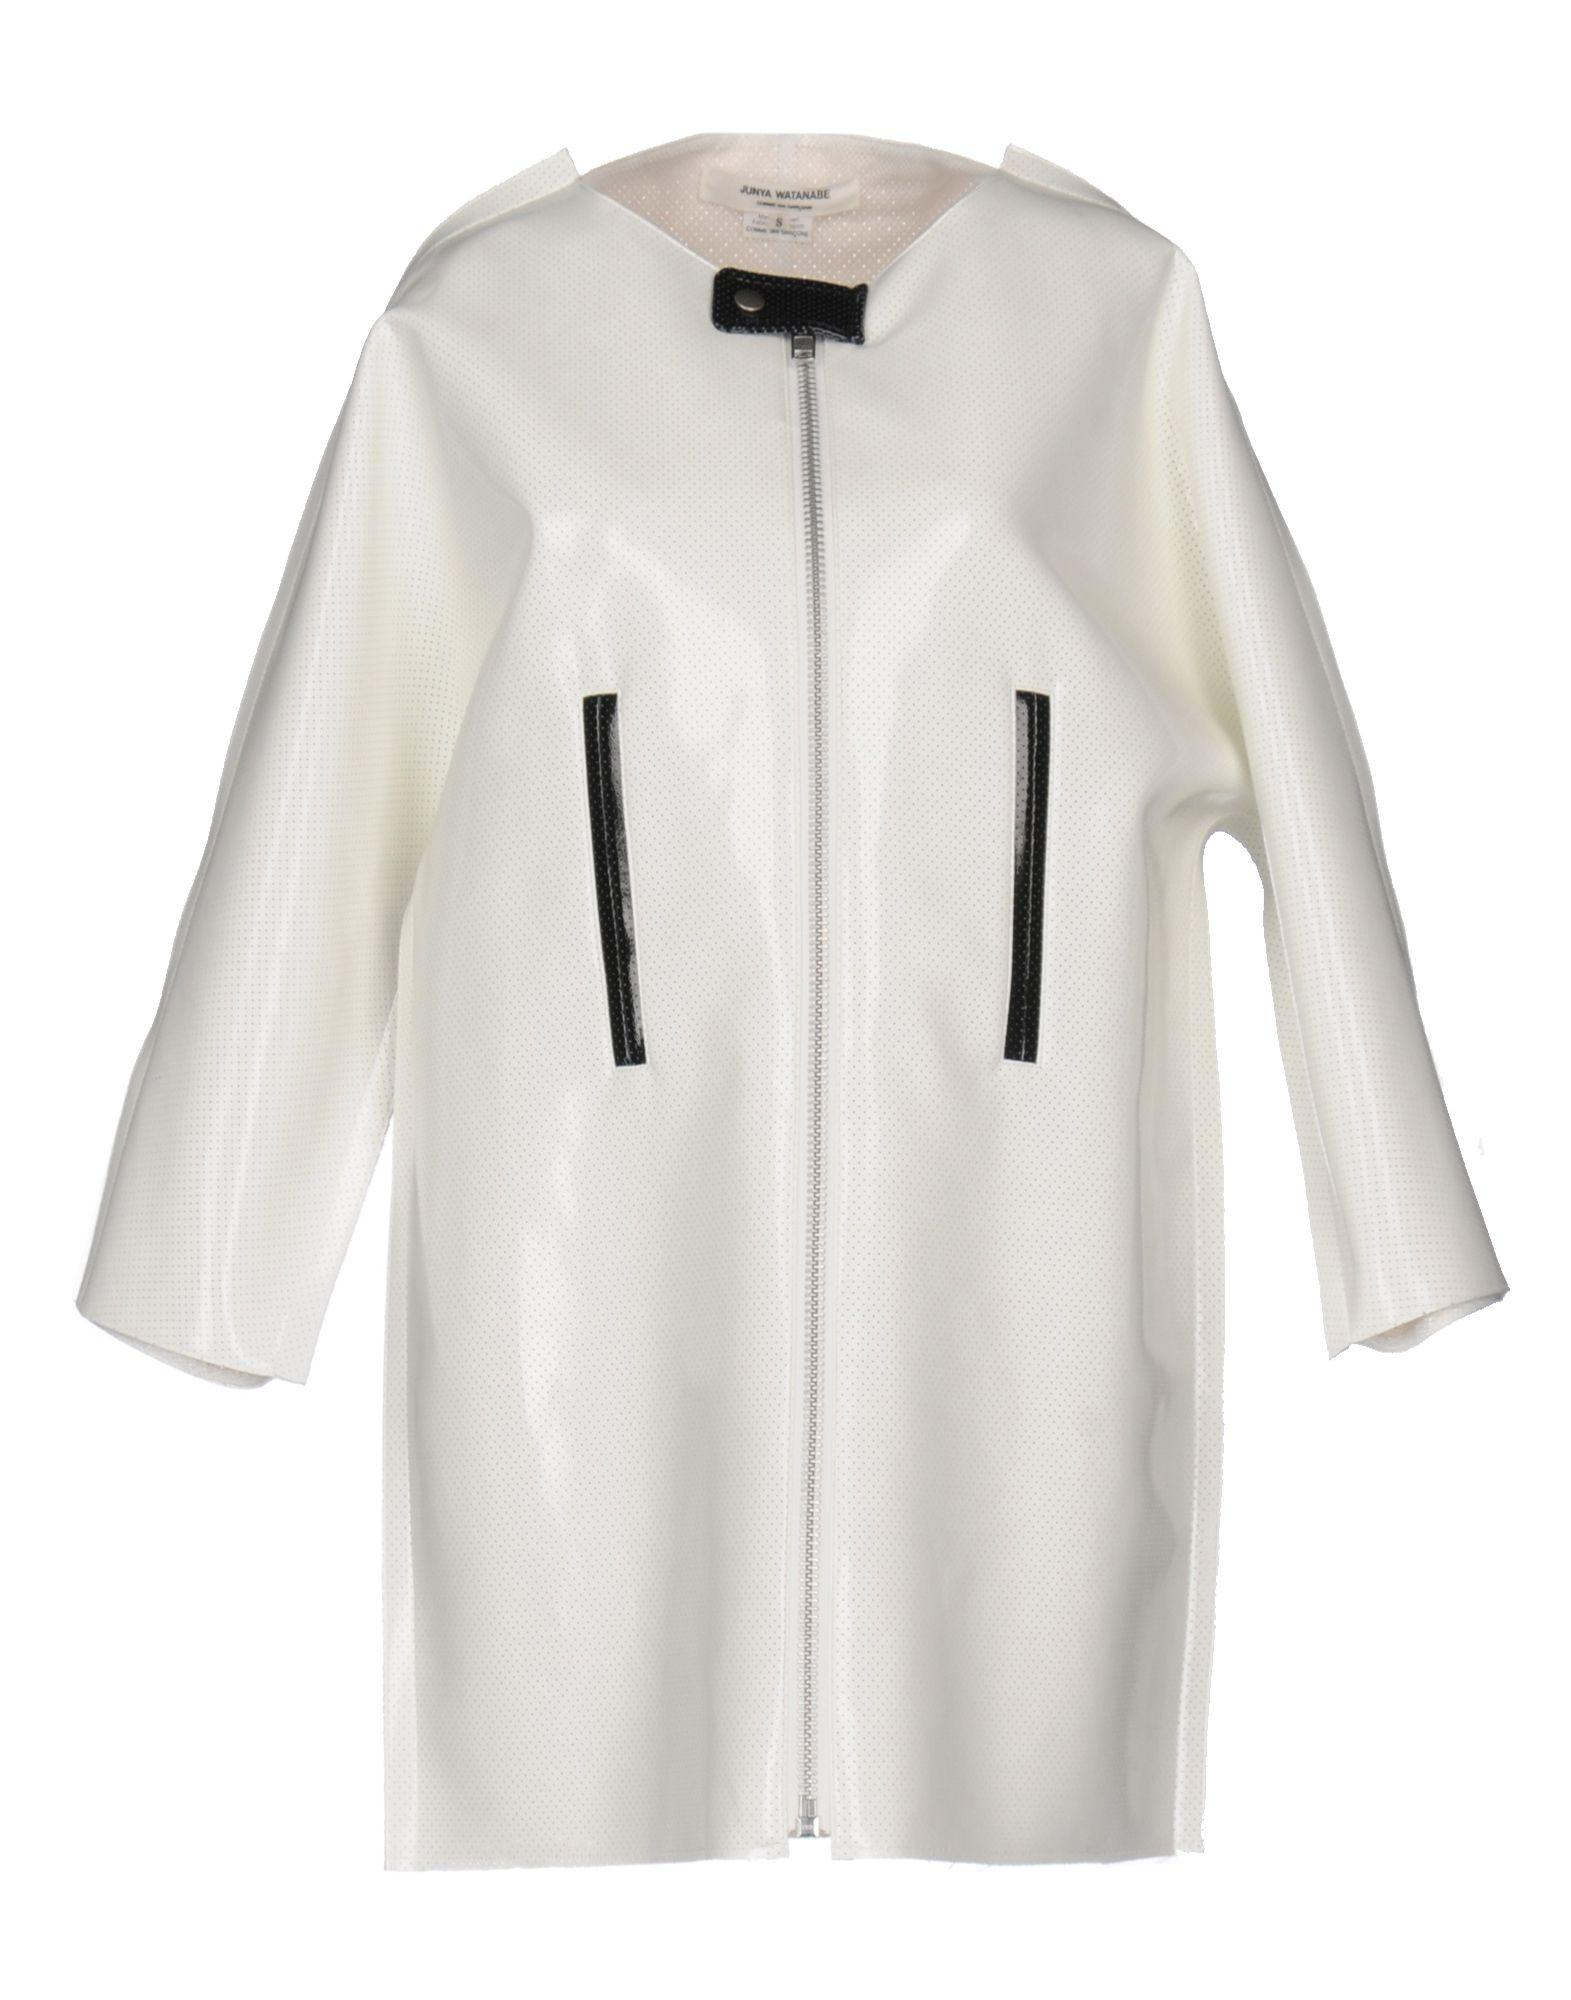 Junya Watanabe Coats In White